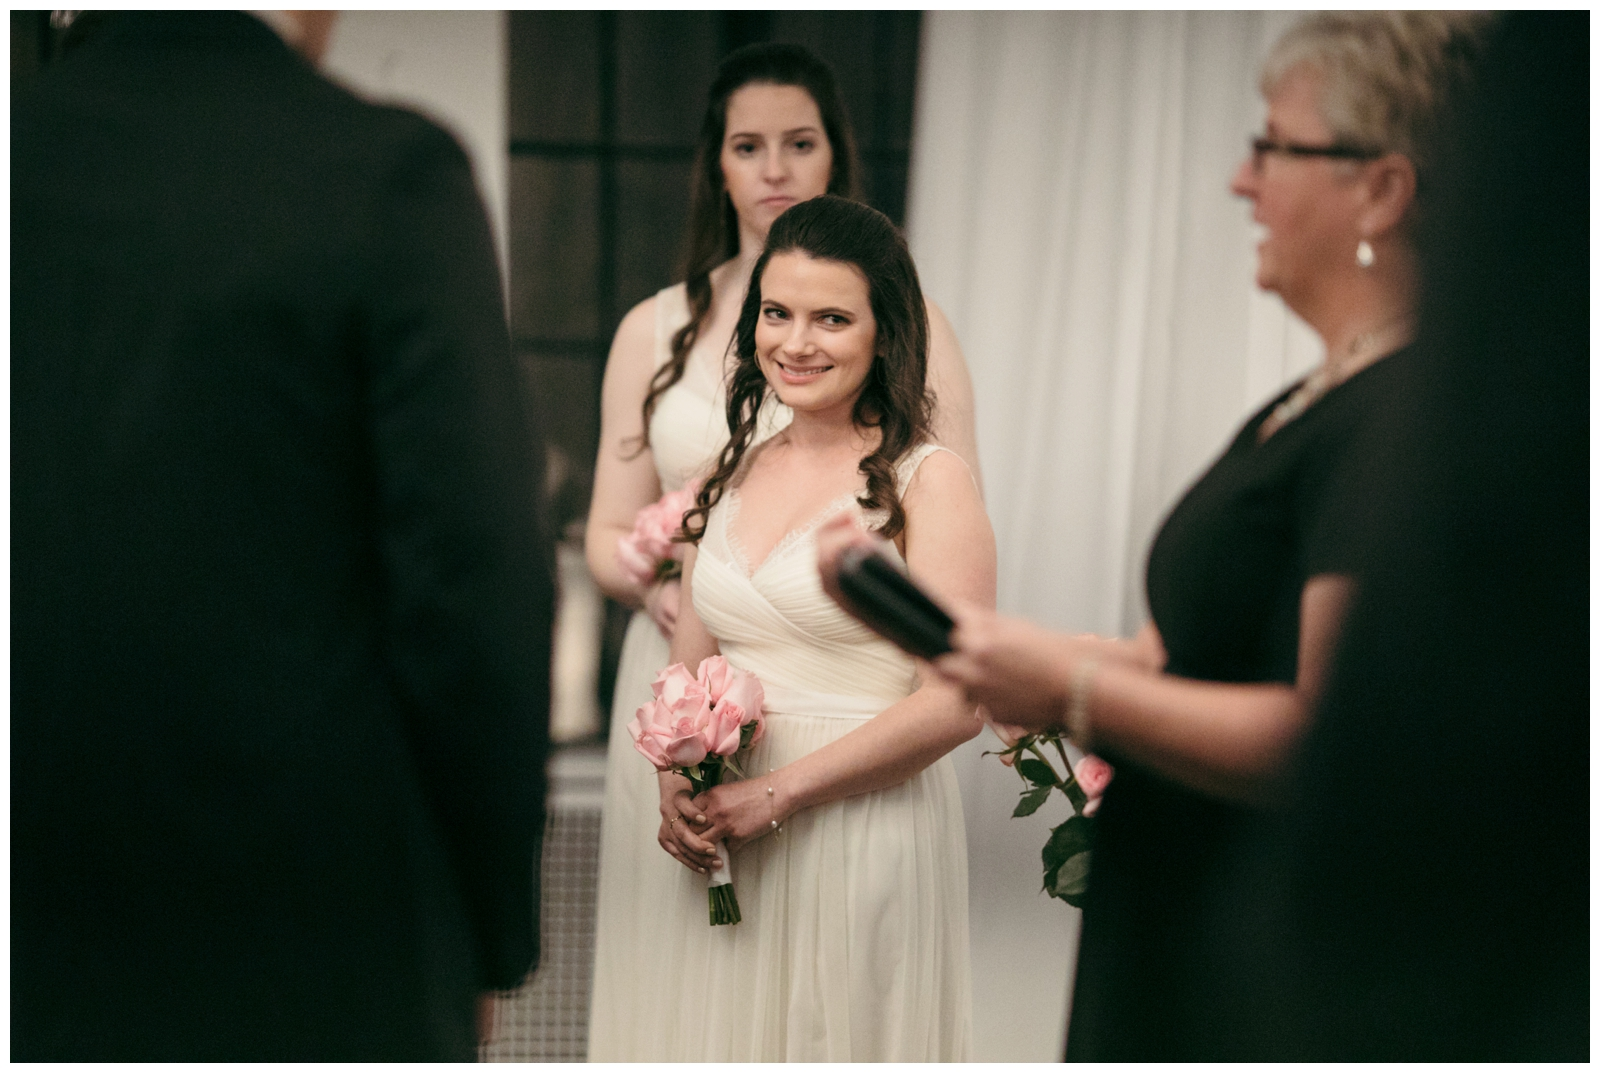 Alden-Castle-Wedding-Boston-Bailey-Q-Photo-018.jpg